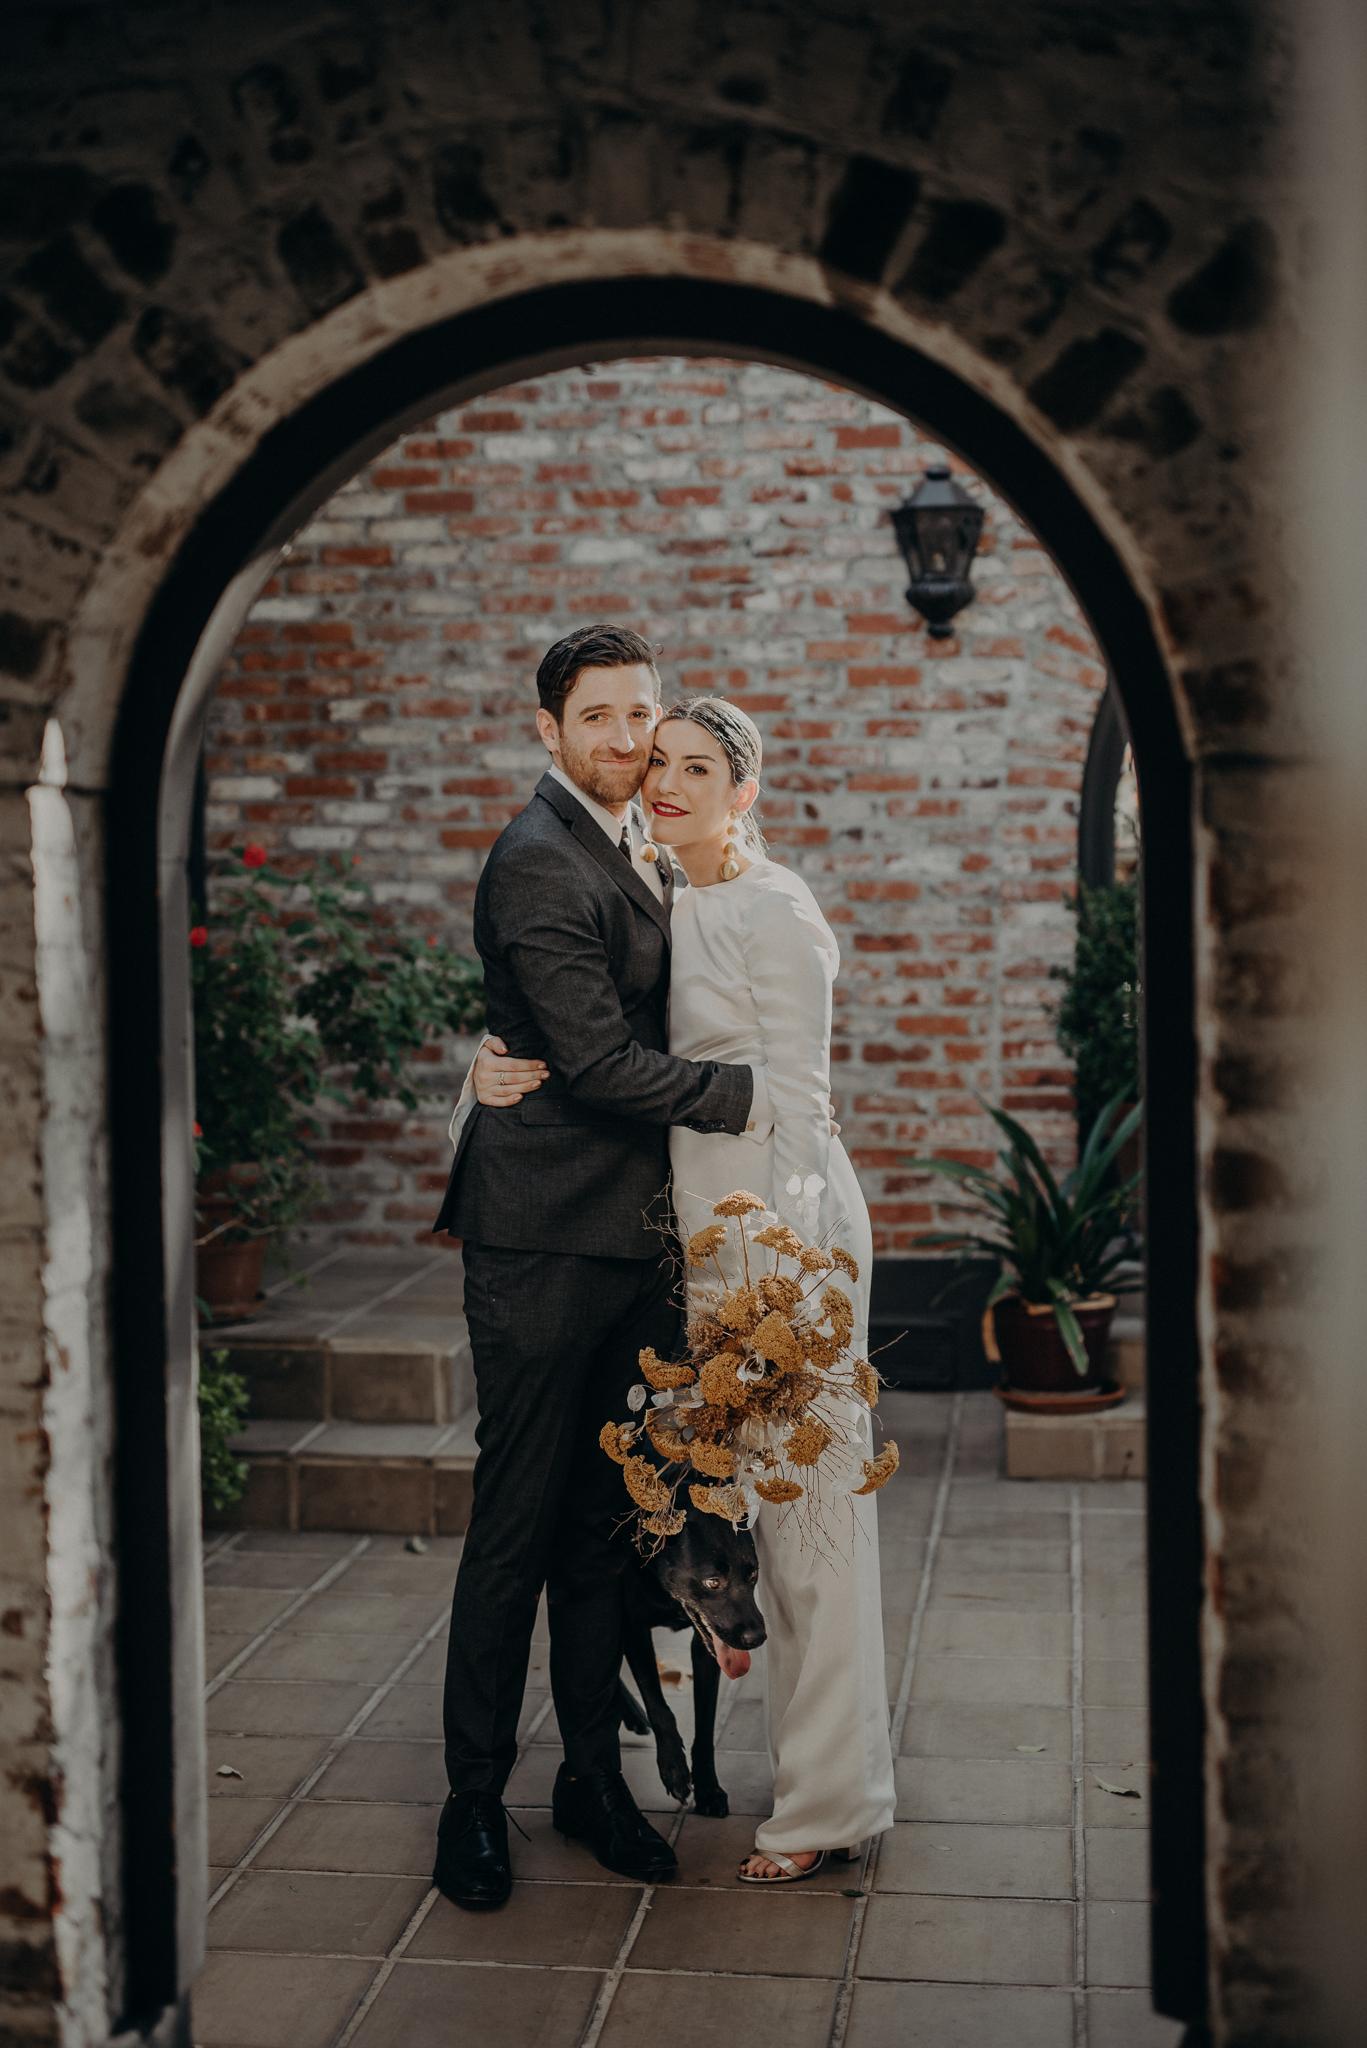 Hummingbird Nest Ranch Wedding - Wedding Photographer in Los Angeles - IsaiahAndTaylor.com